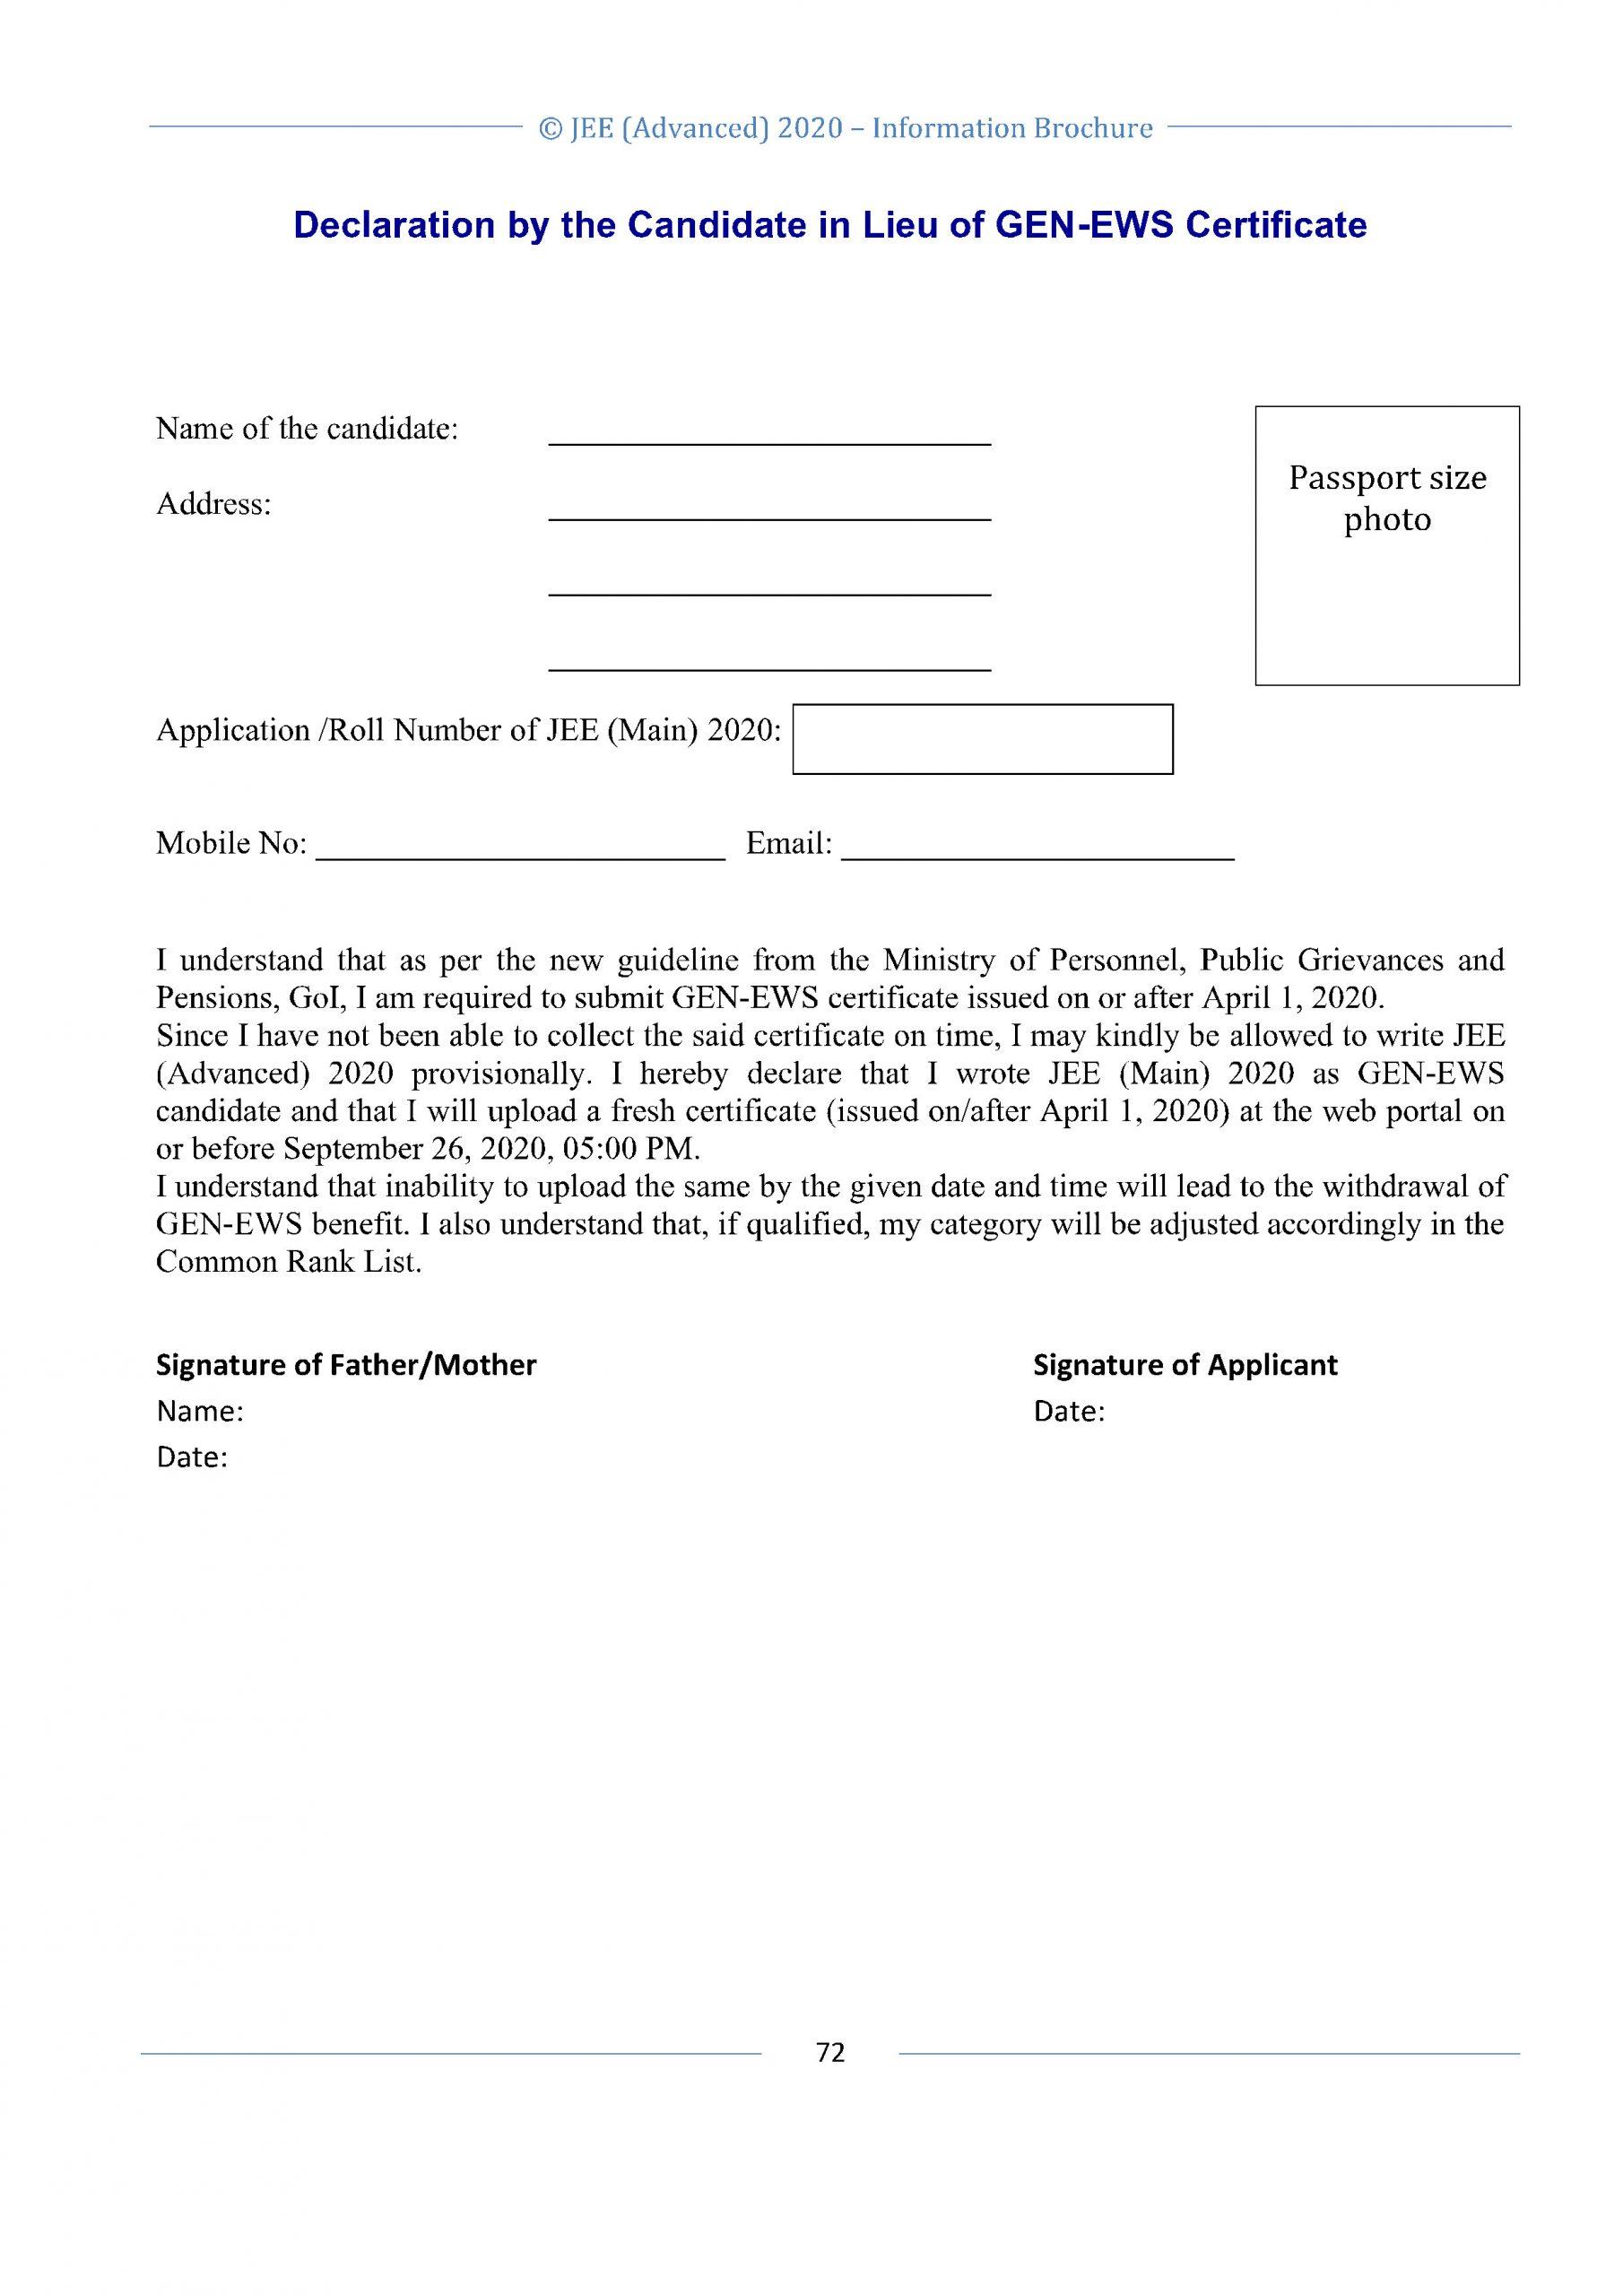 JEE Advanced LIEU Certificate Download